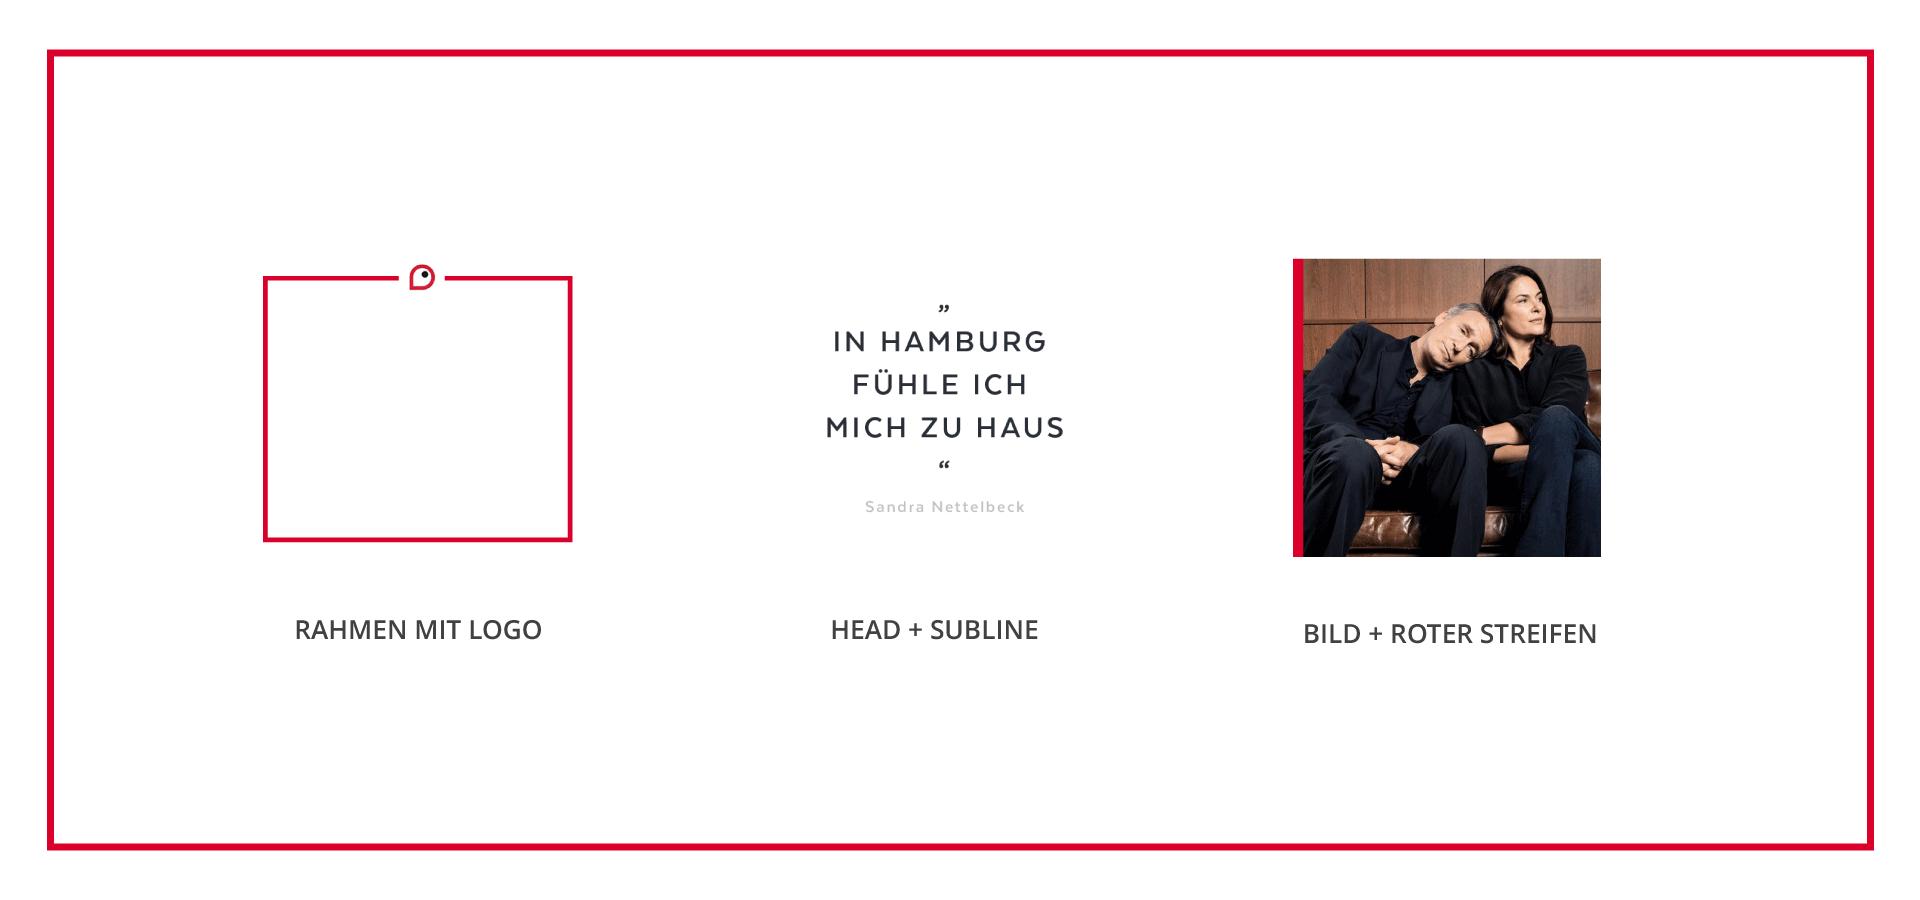 Filmförderung Hamburg SH SoMe-Postings Aufbau